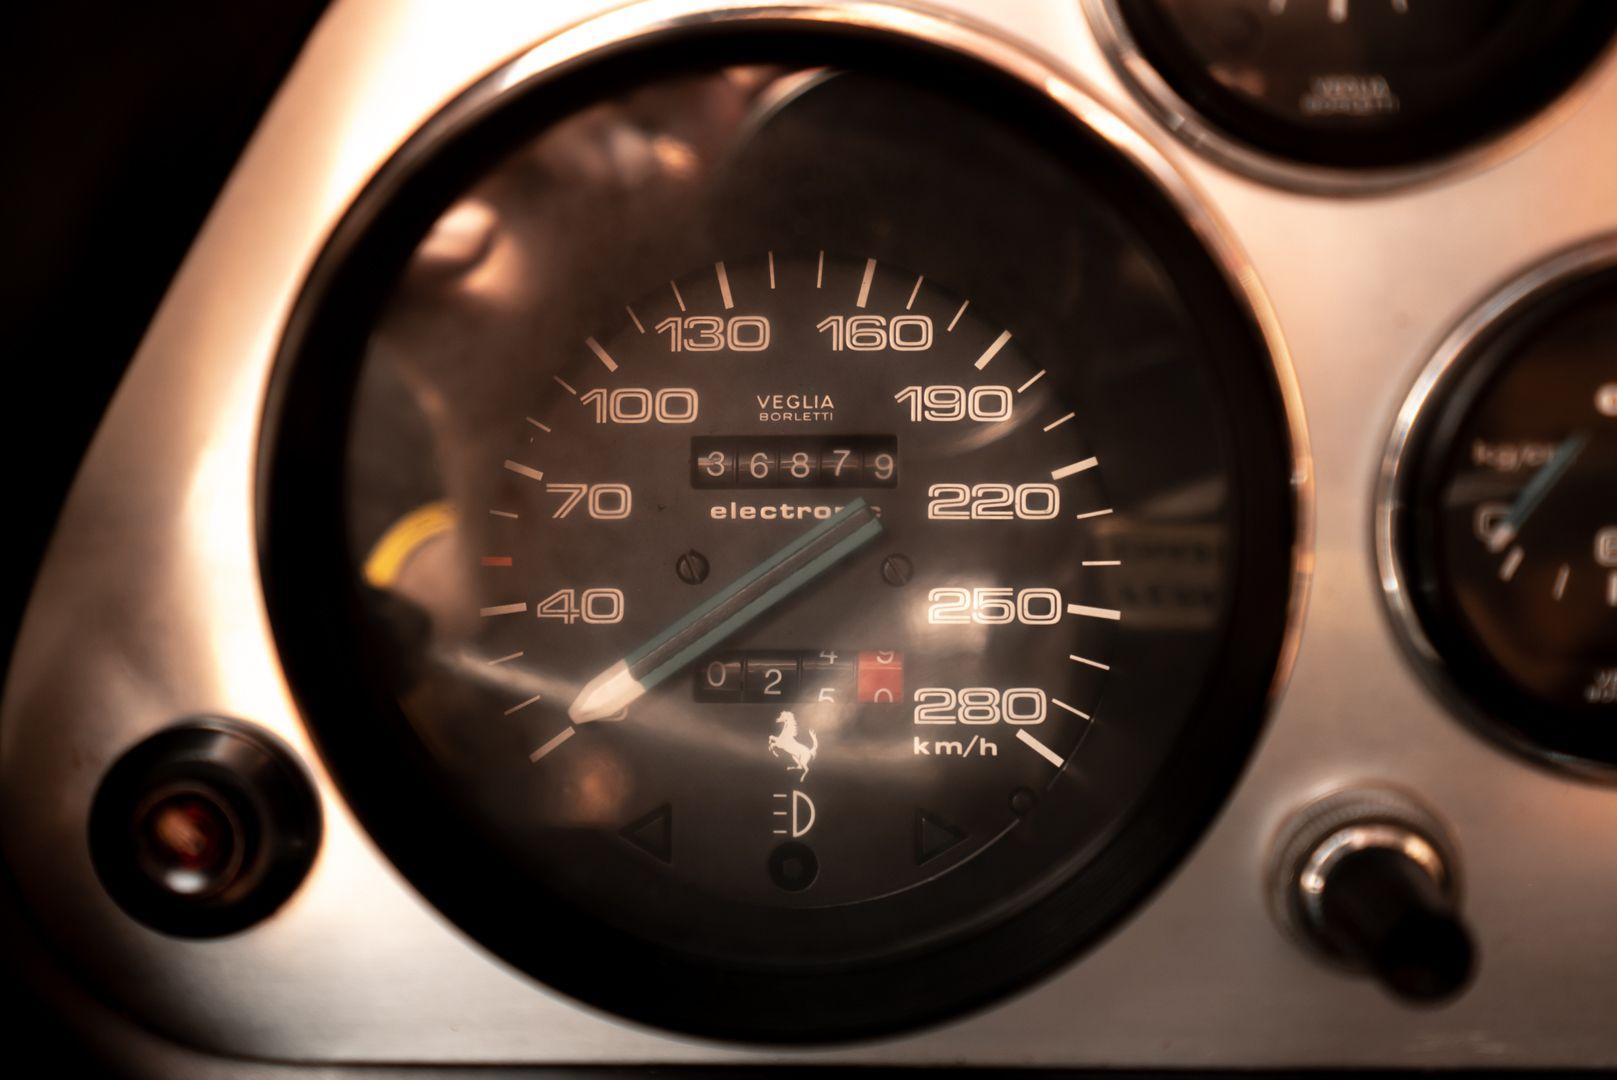 1976 Ferrari 308 GTB Vetroresina 74068